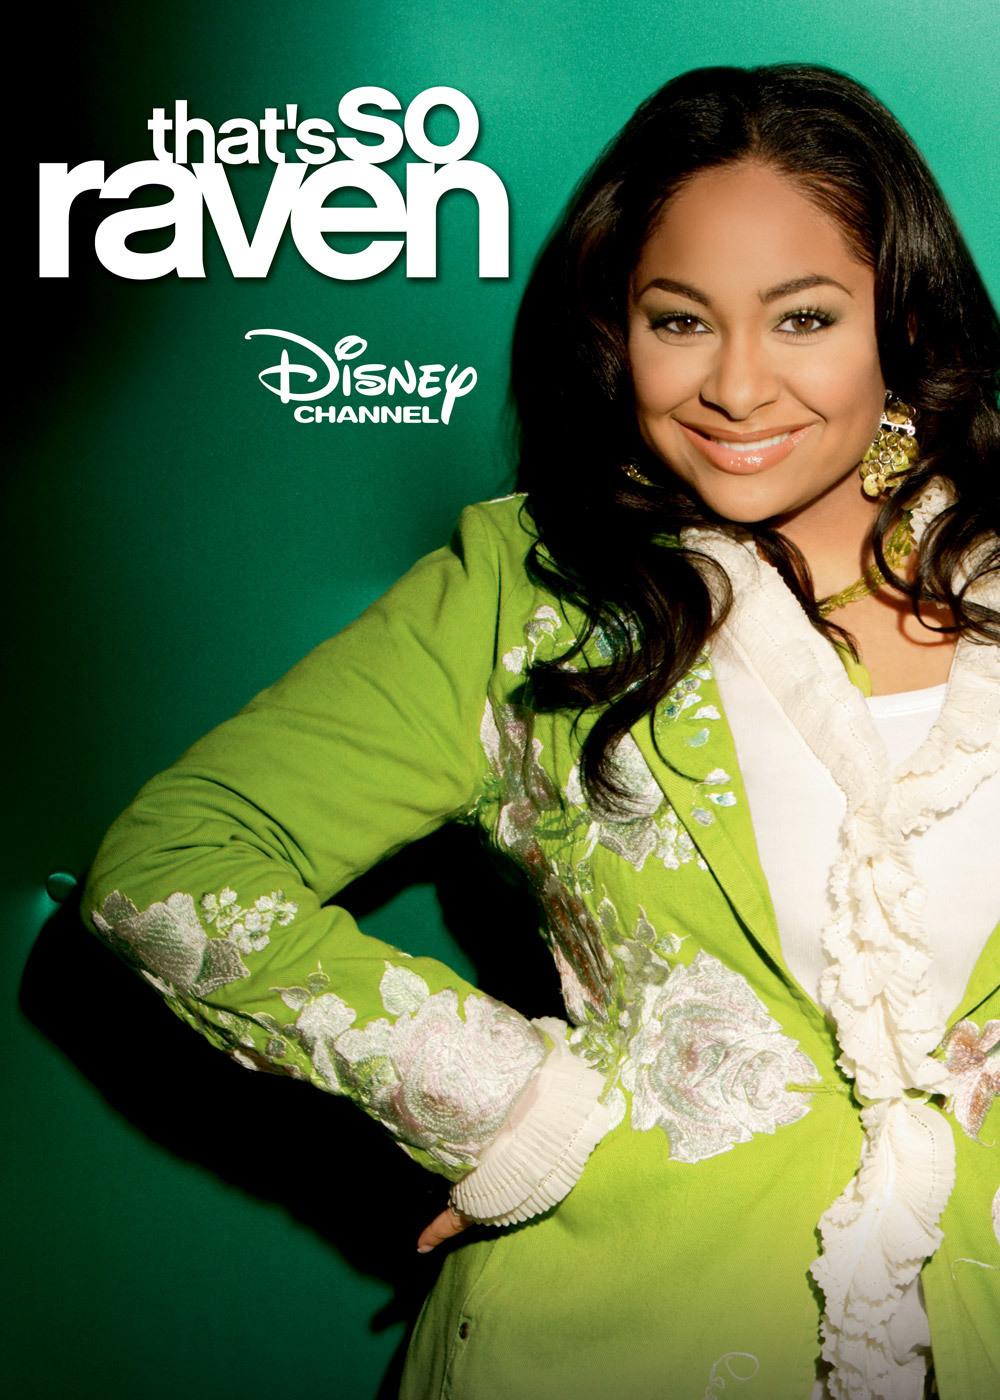 That's So Raven